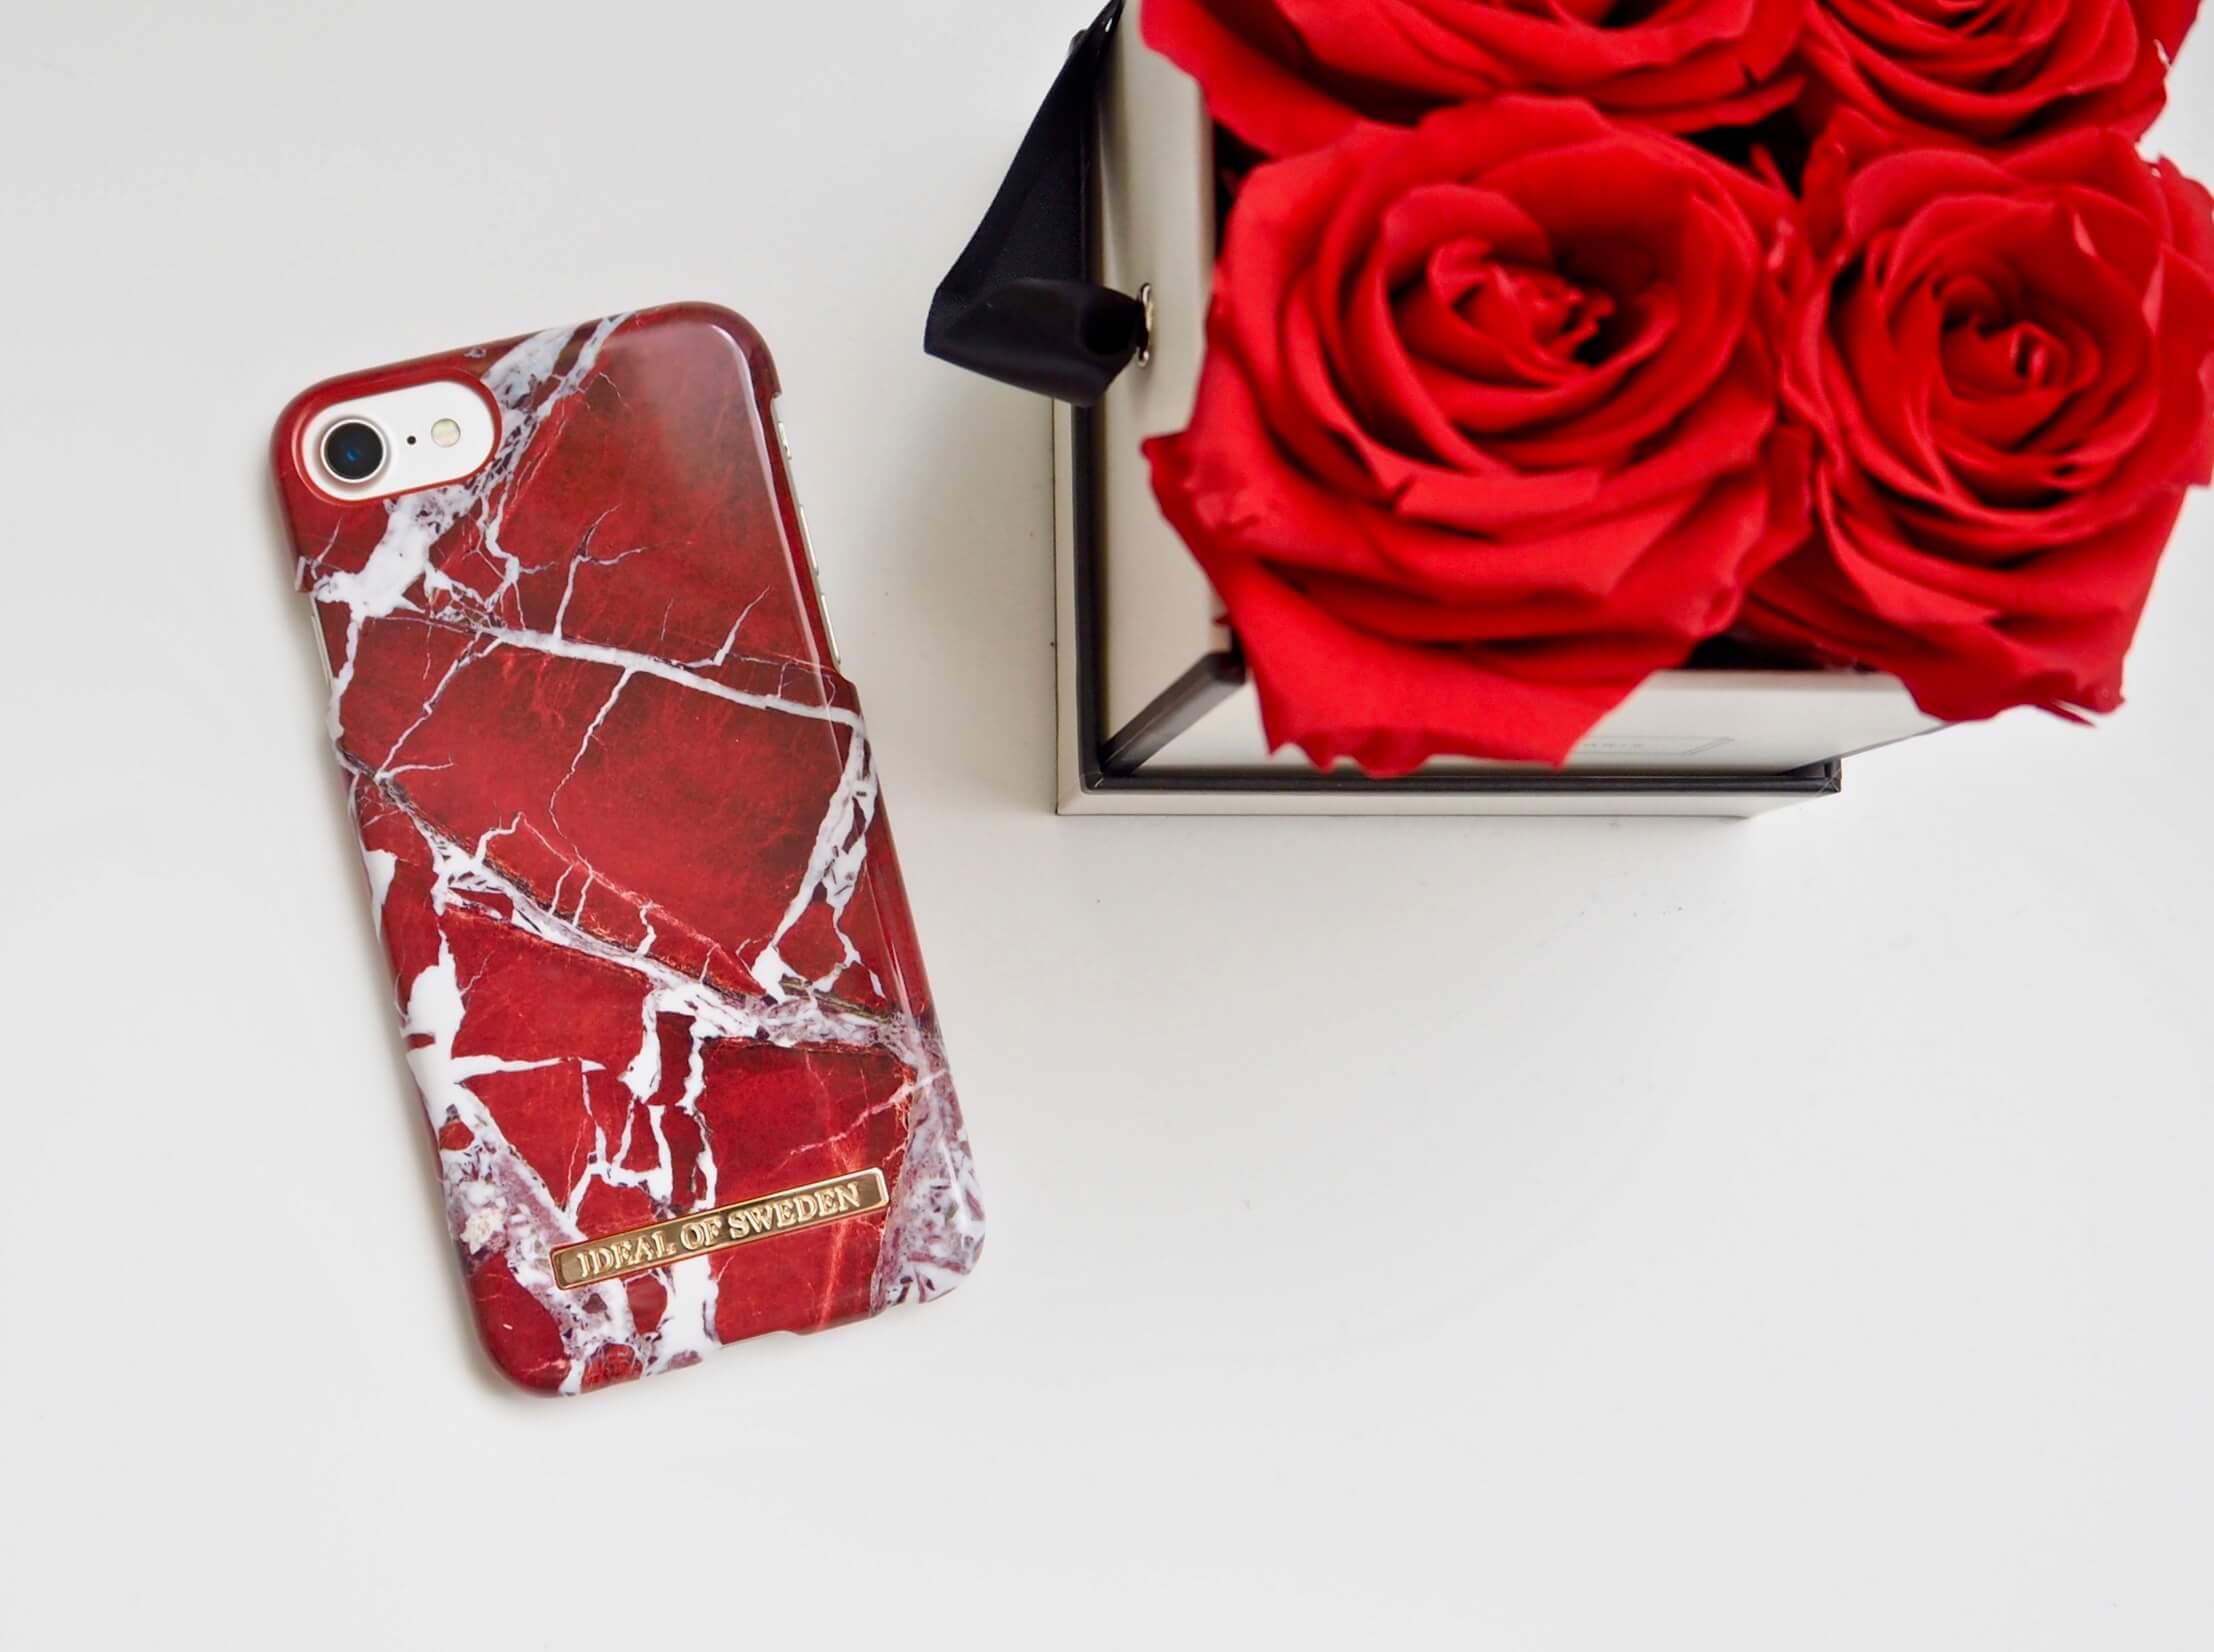 iDeal of Sweden Scarlet red Marble